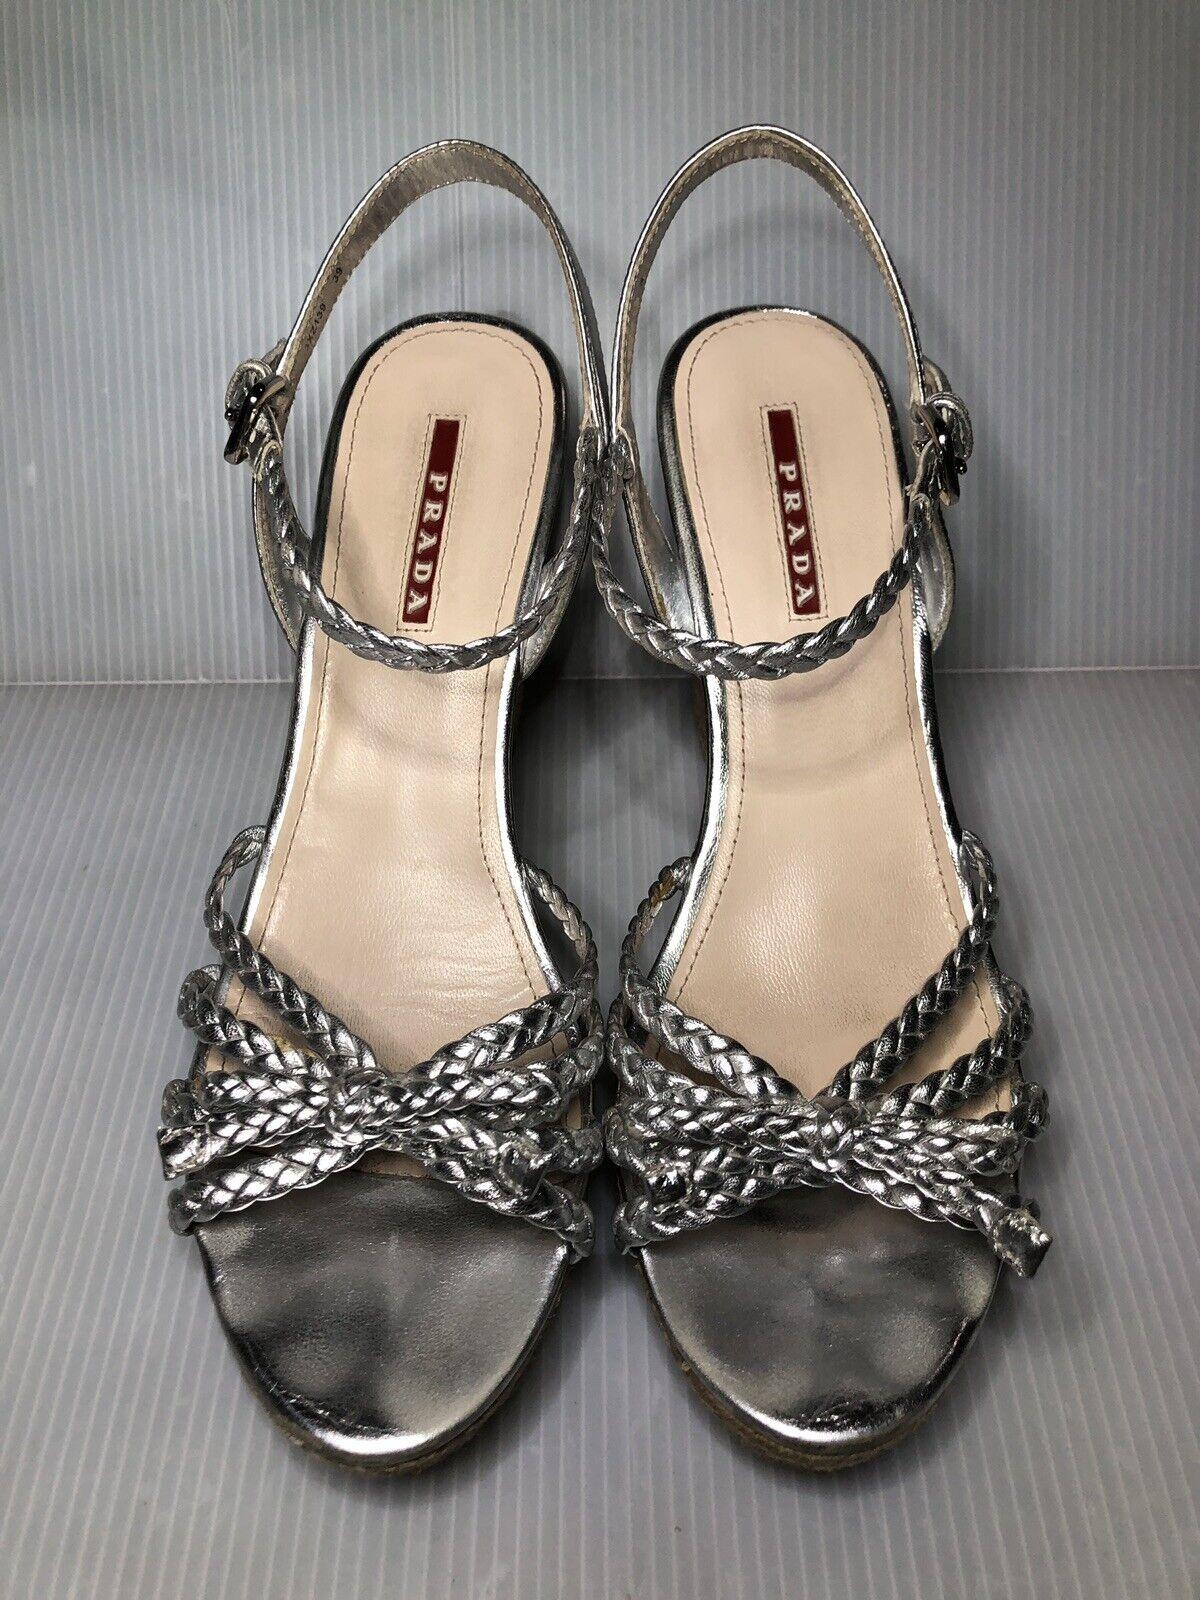 PRADA Leather Cork Wedge Braed argento  Metallic Sandals 39EU  8US Runs Small  vendita online